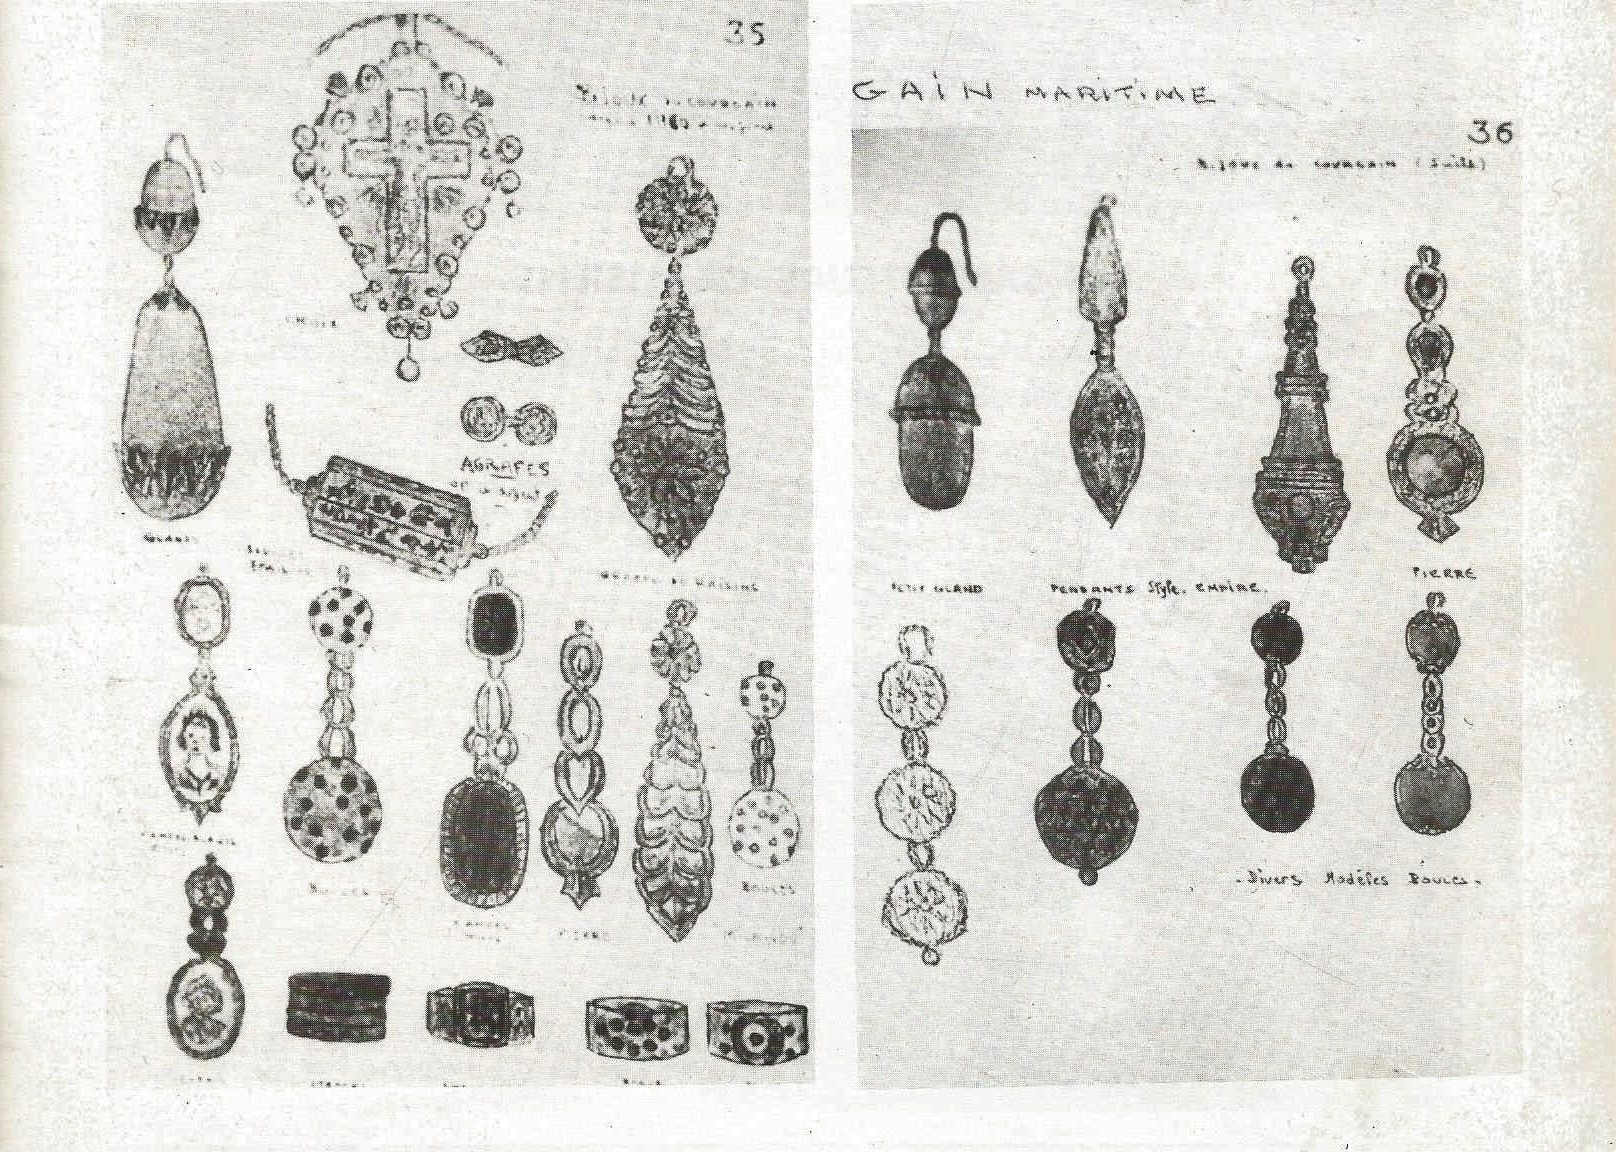 Calais modeles de bijoux du courgain maritime de calais